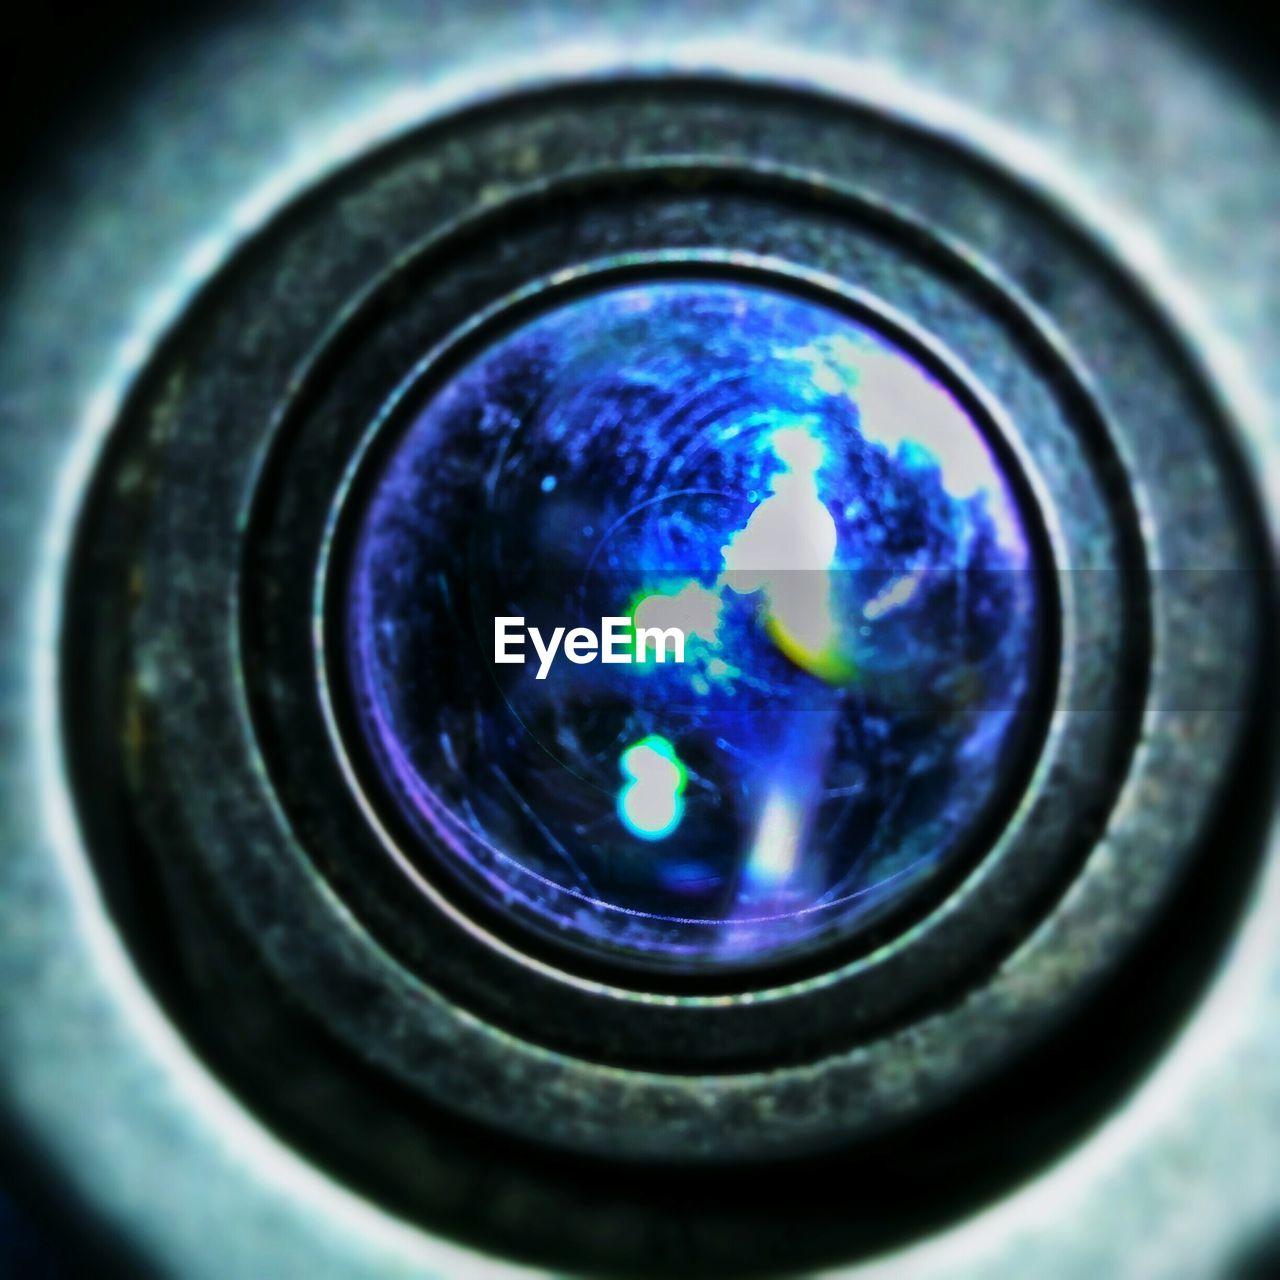 circle, close-up, indoors, no people, camera - photographic equipment, technology, day, eyeball